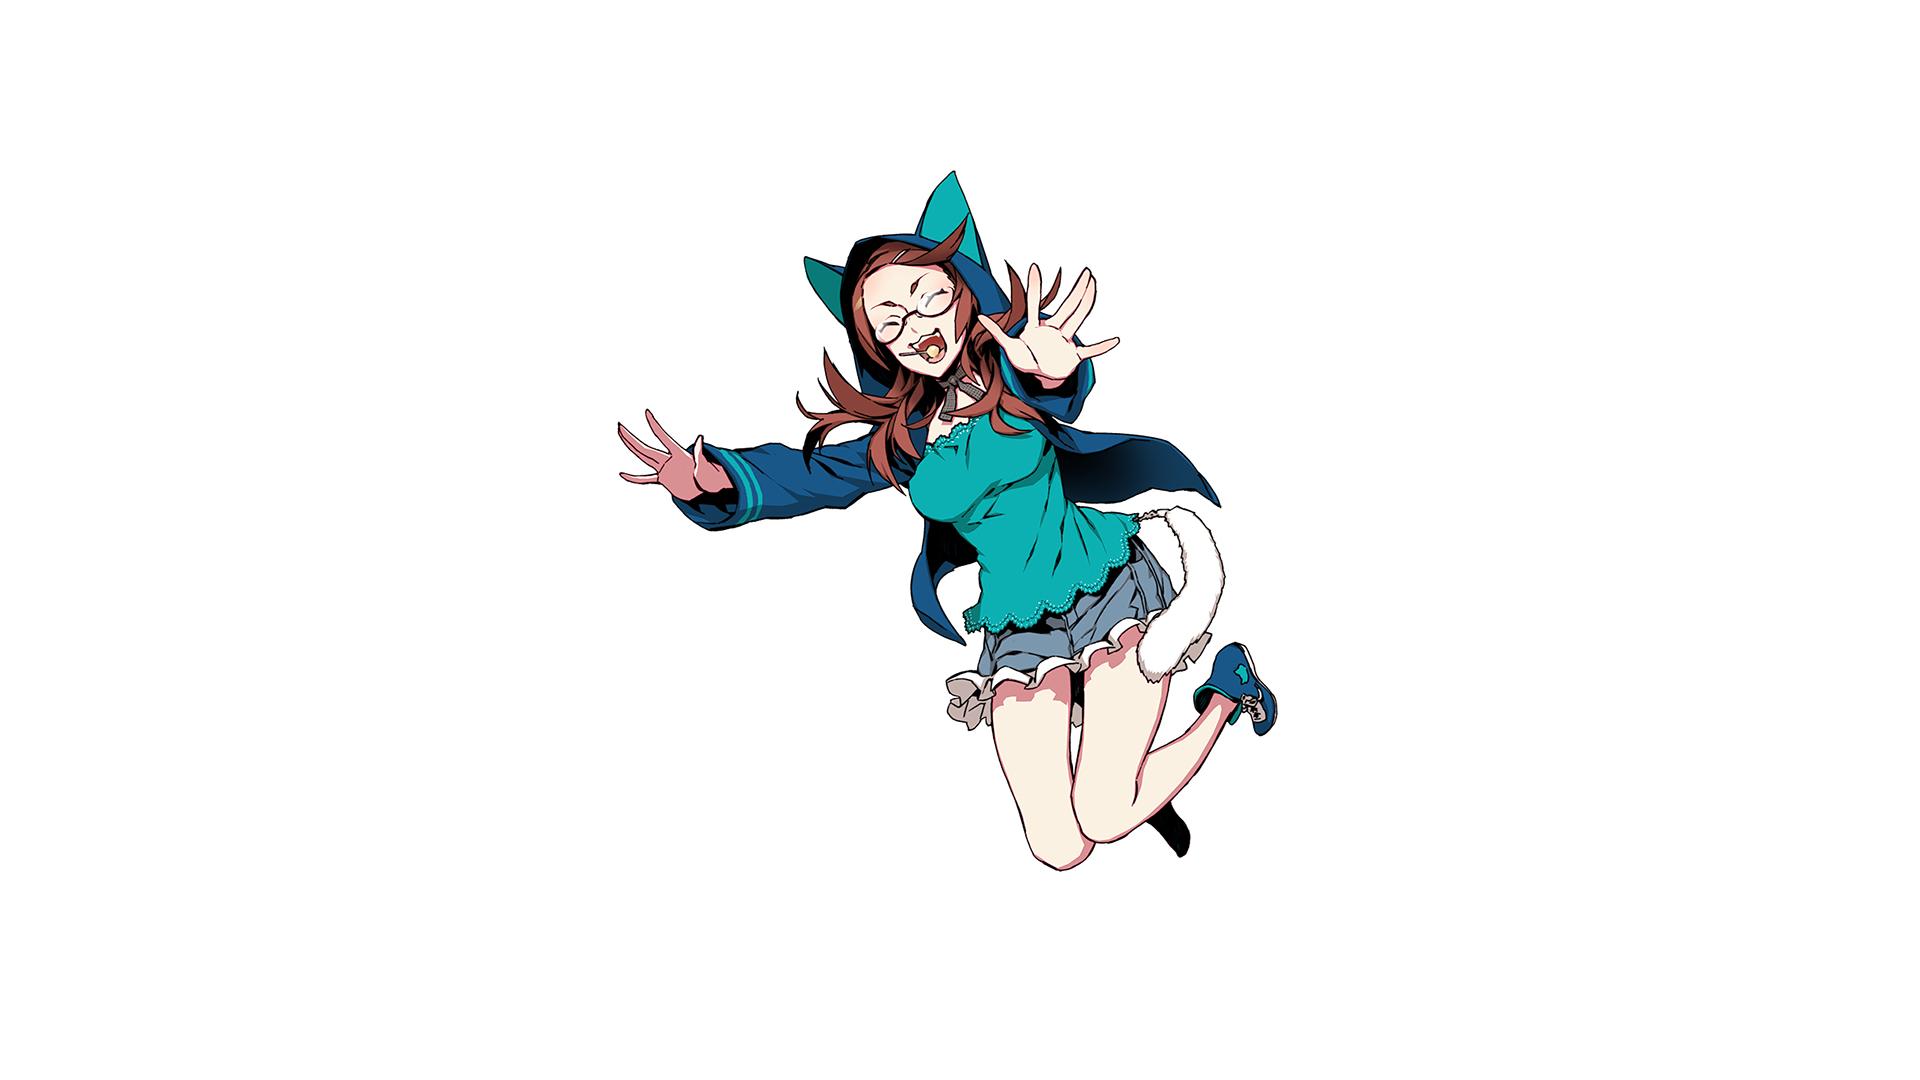 Wallpaper putih ilustrasi latar belakang yang sederhana putih ilustrasi latar belakang yang sederhana nekomimi anime gadis anime gambar kartun kaca manisan 7 naga altavistaventures Images